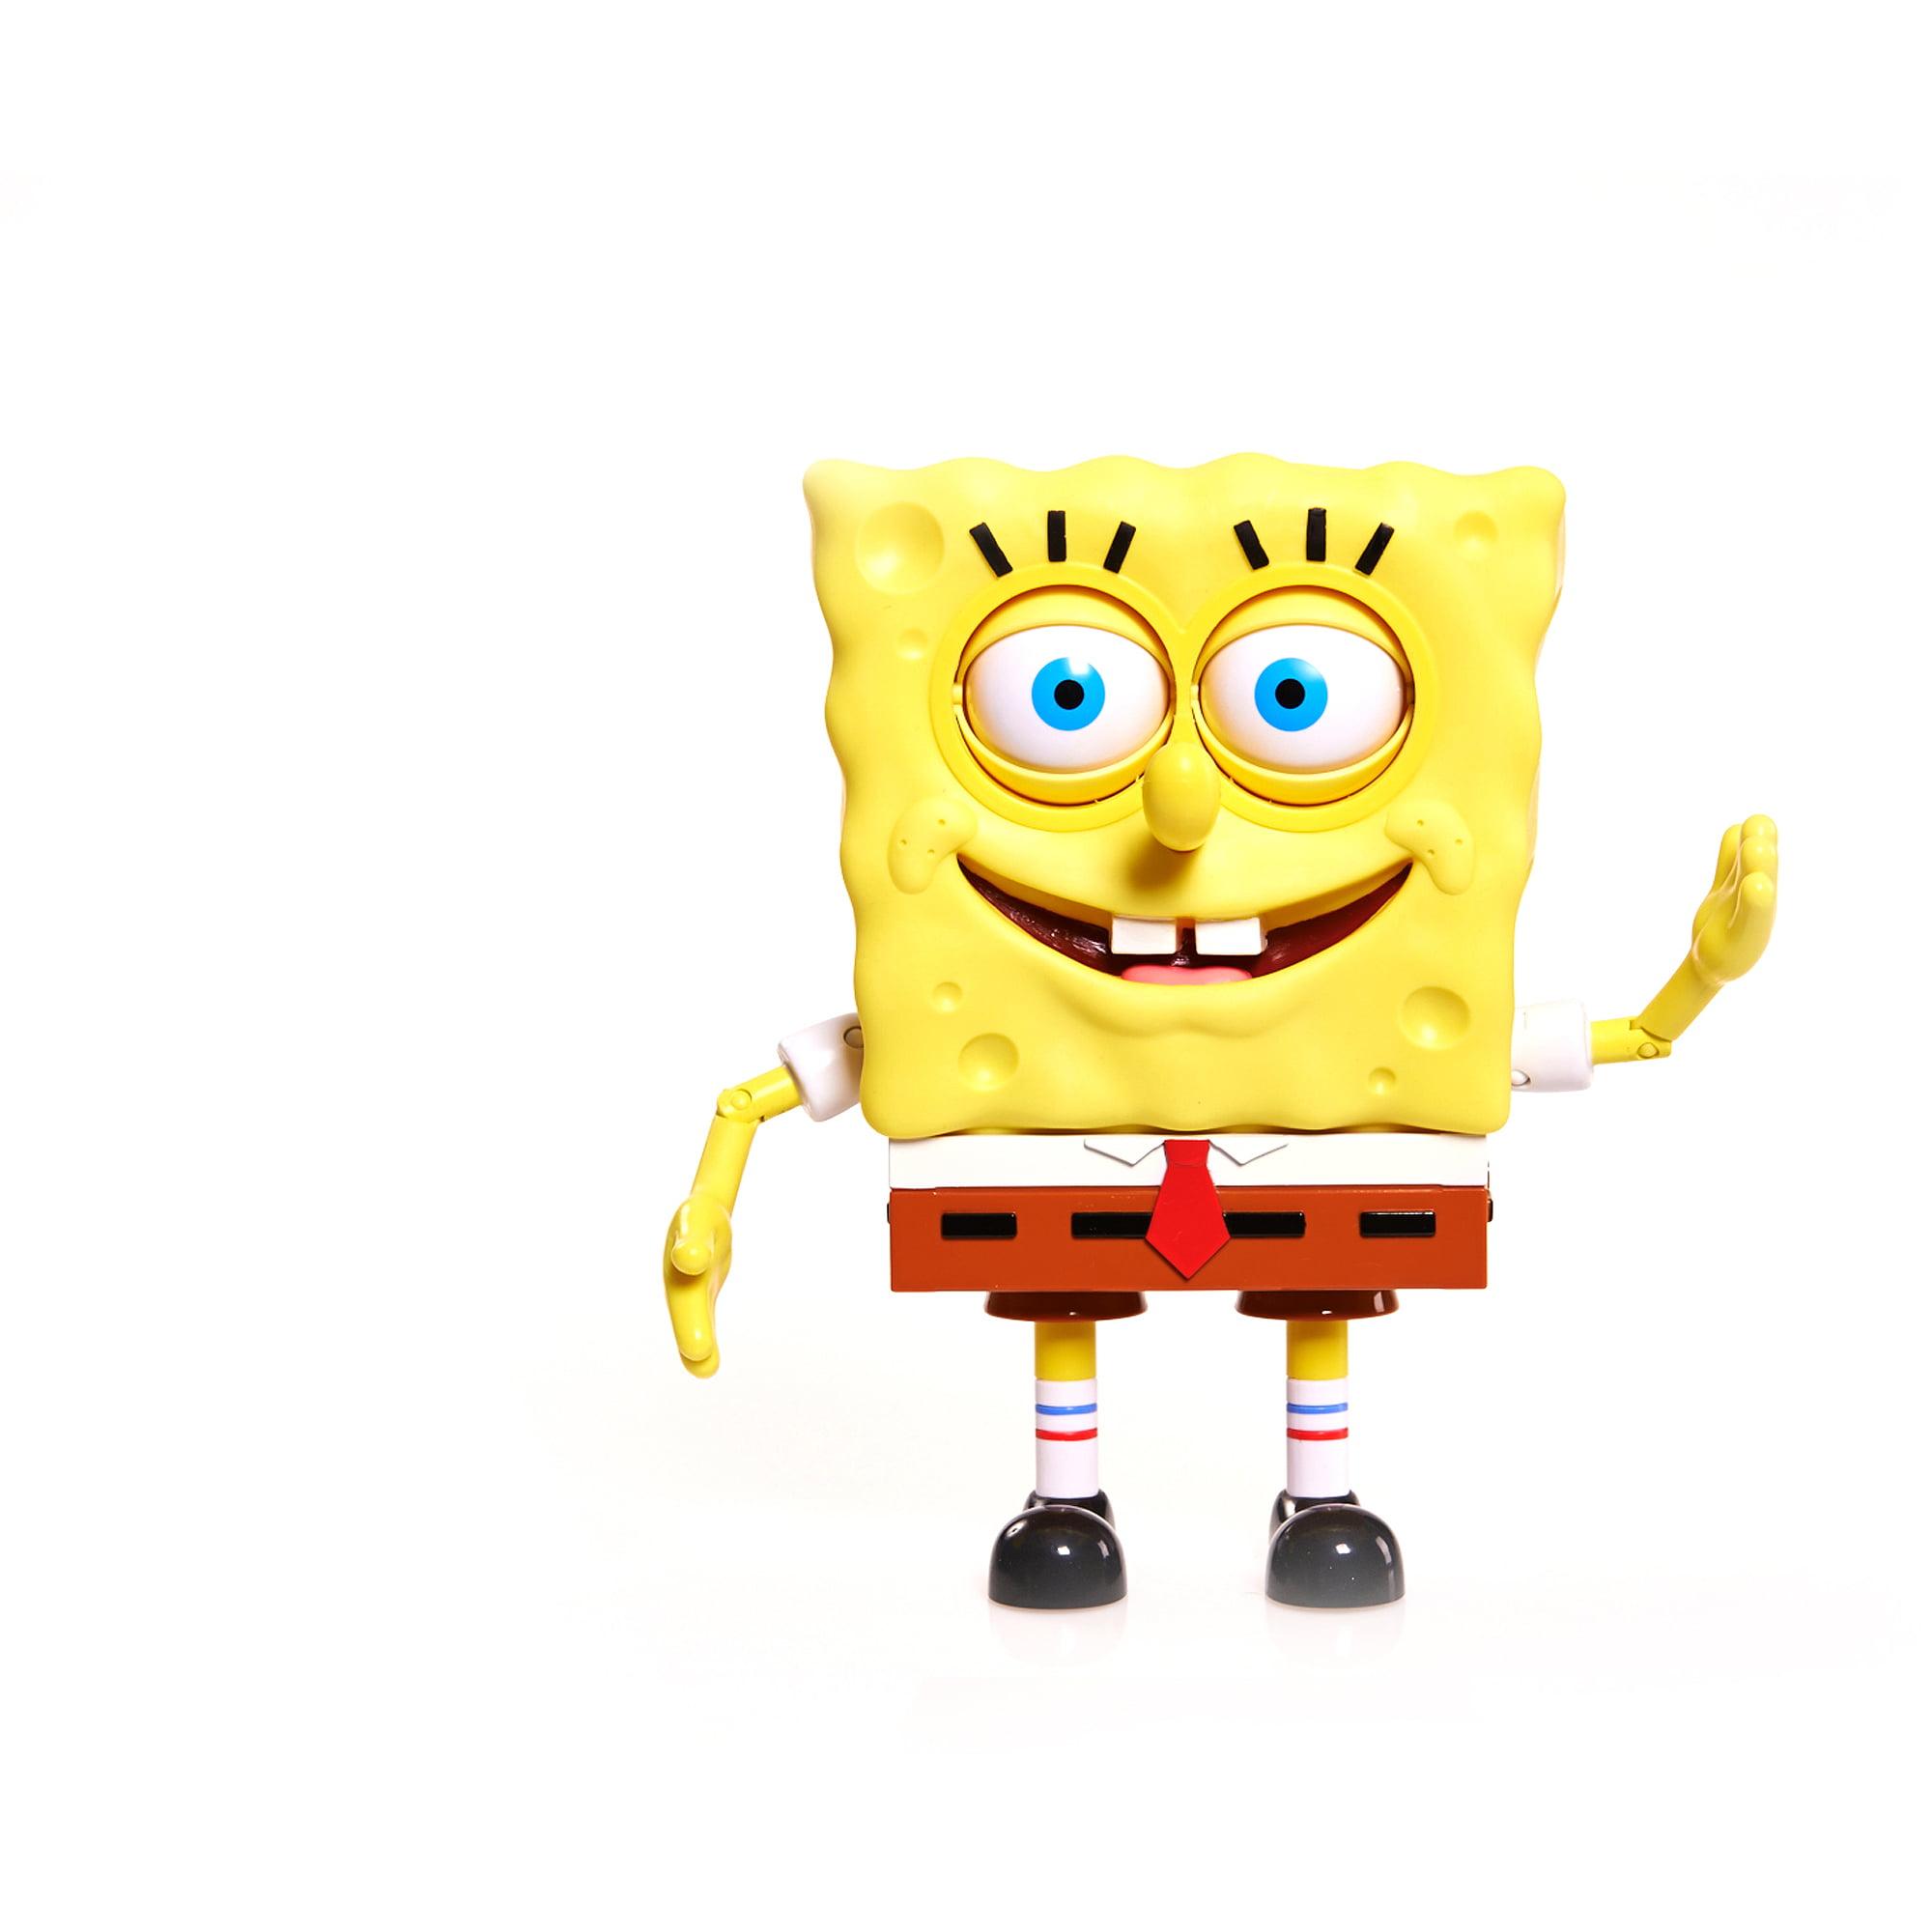 Nickelodeon SpongeBob SpongeBuddy SquarePants - Walmart.com